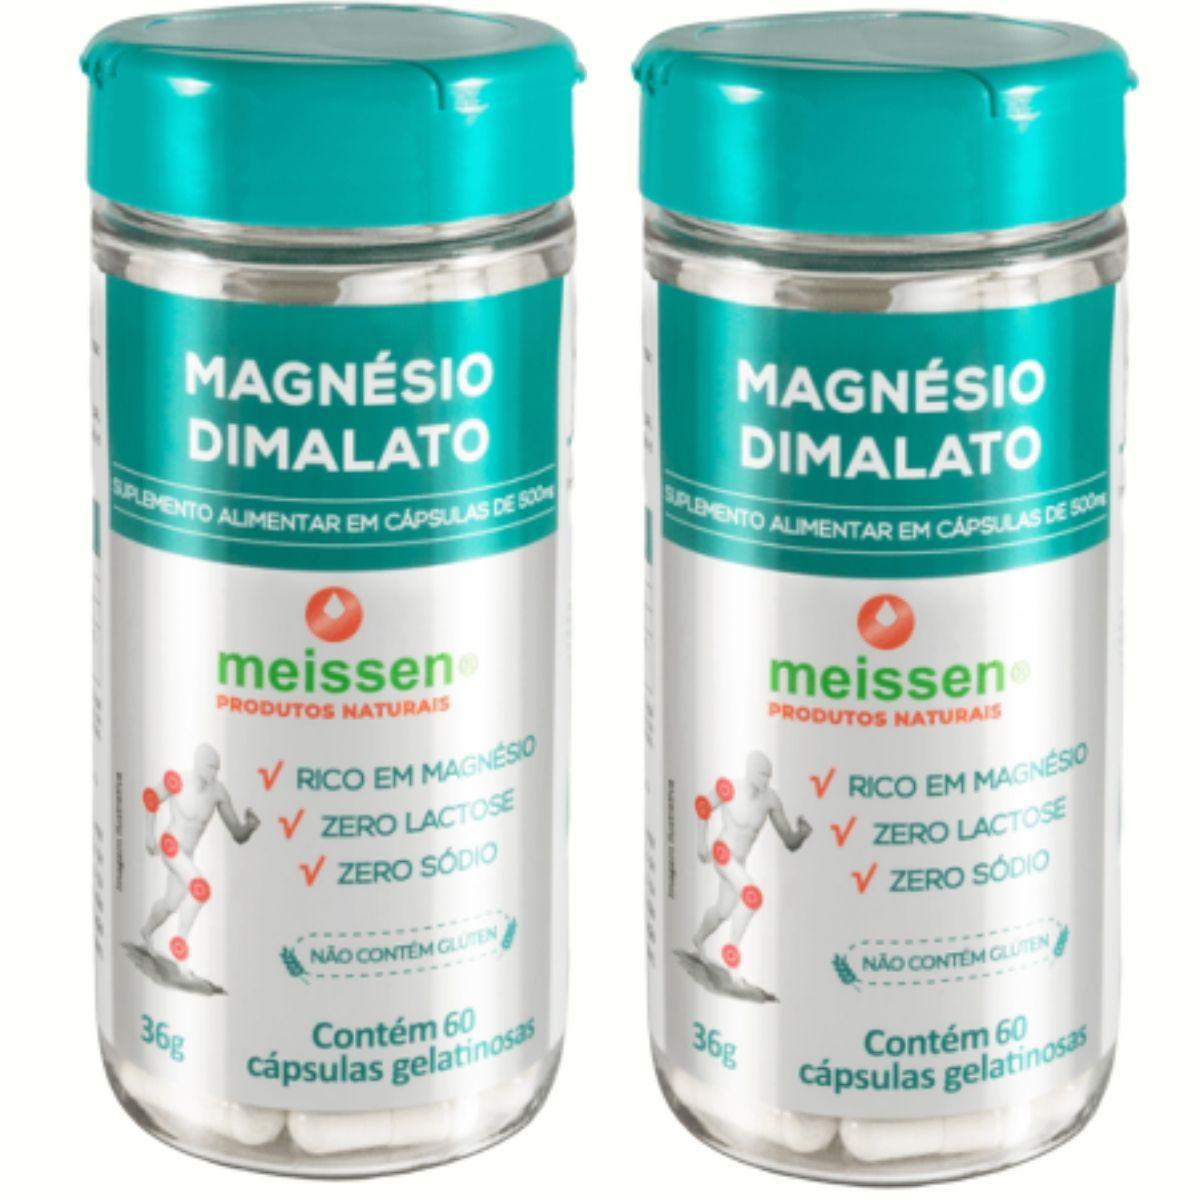 2 Magnesio Dimalato Puro - Total 120 Capsulas - 2 x Dia - Meissen